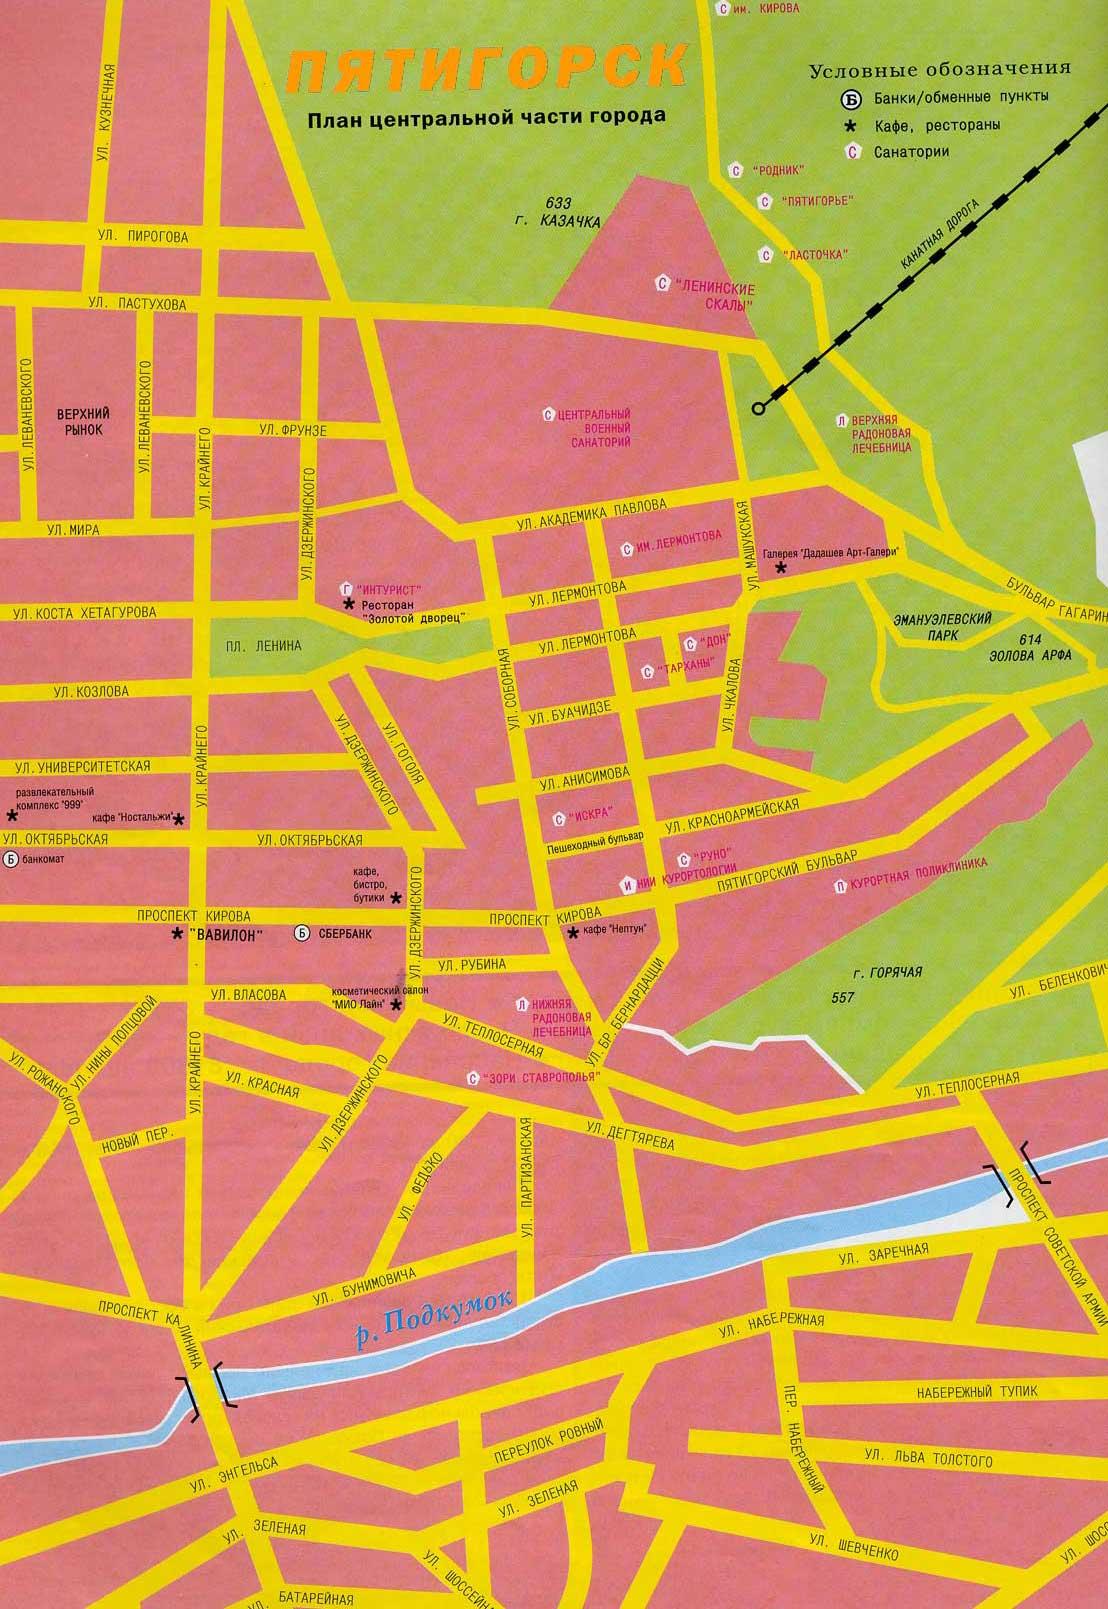 Реклама на сайте. карты других курортов.  Вид санаториев на карте Пятигорска со спутника.